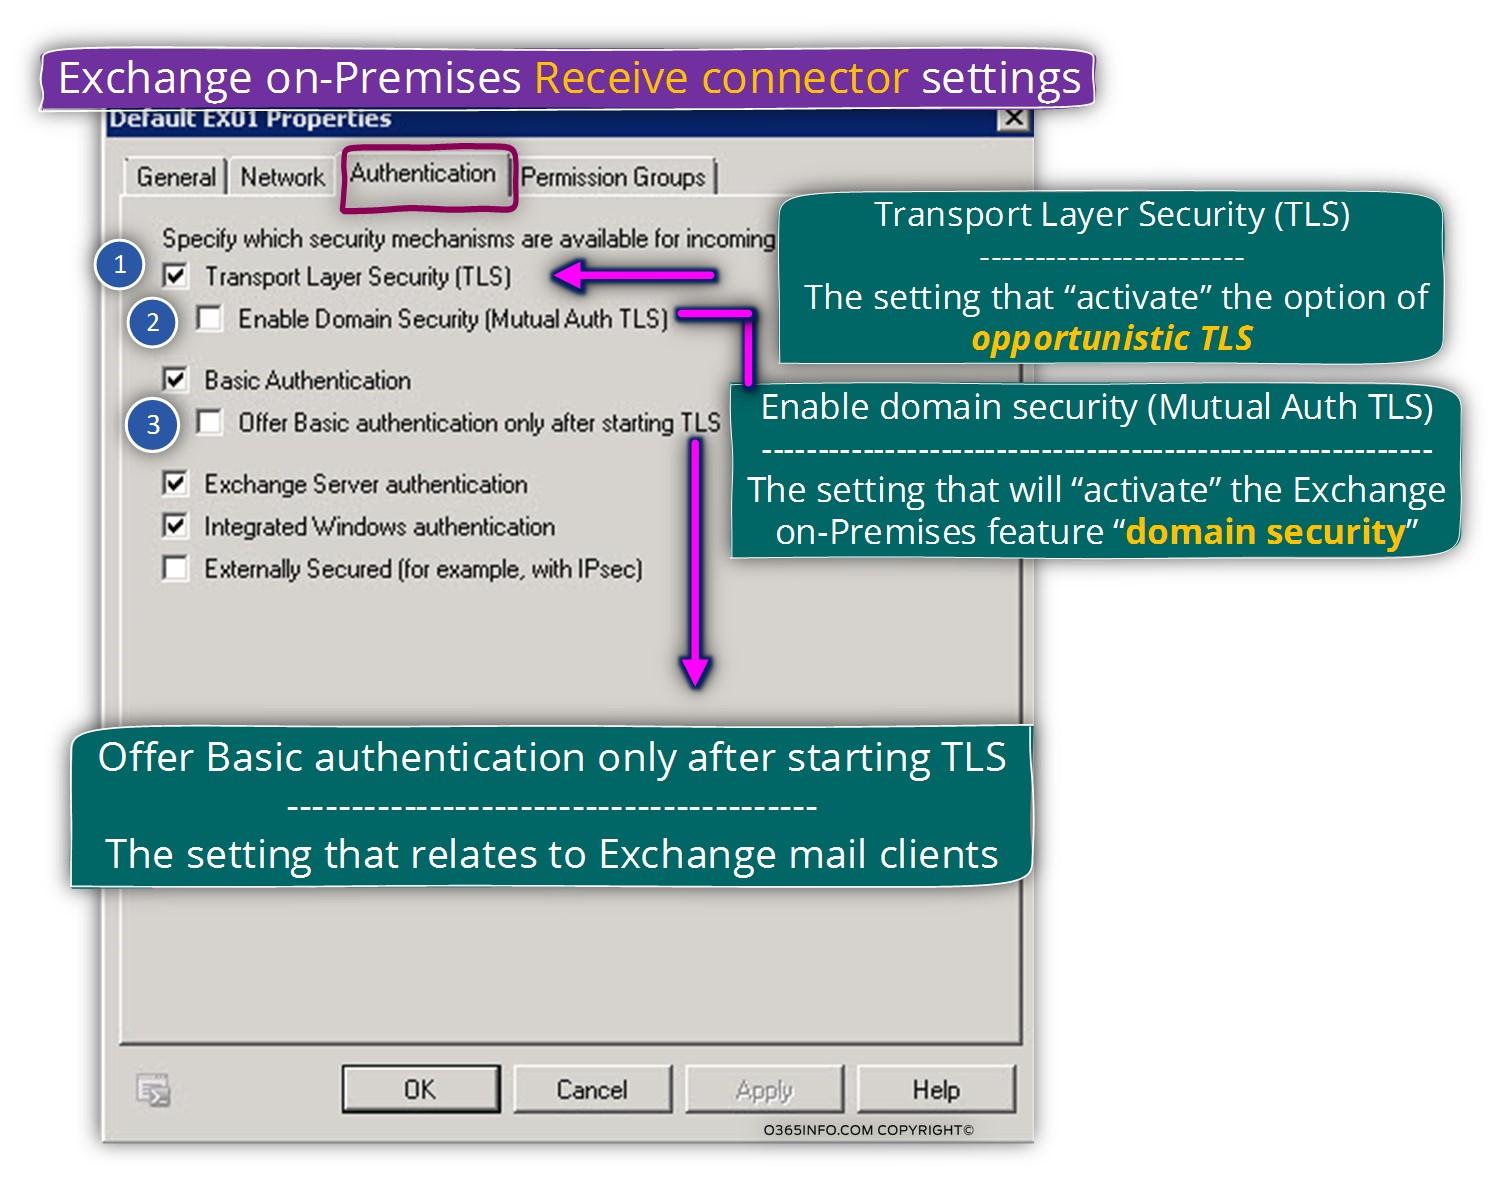 Exchange on-Premises server - Receive connector - opportunistic TLS -03